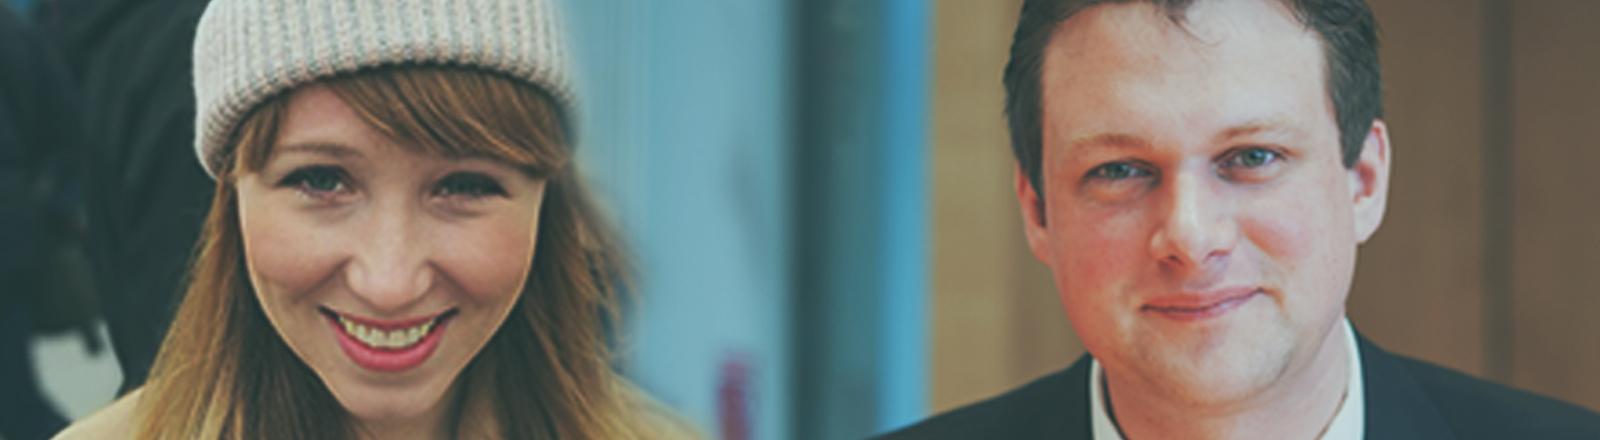 Elli Veh & Tobias Zech